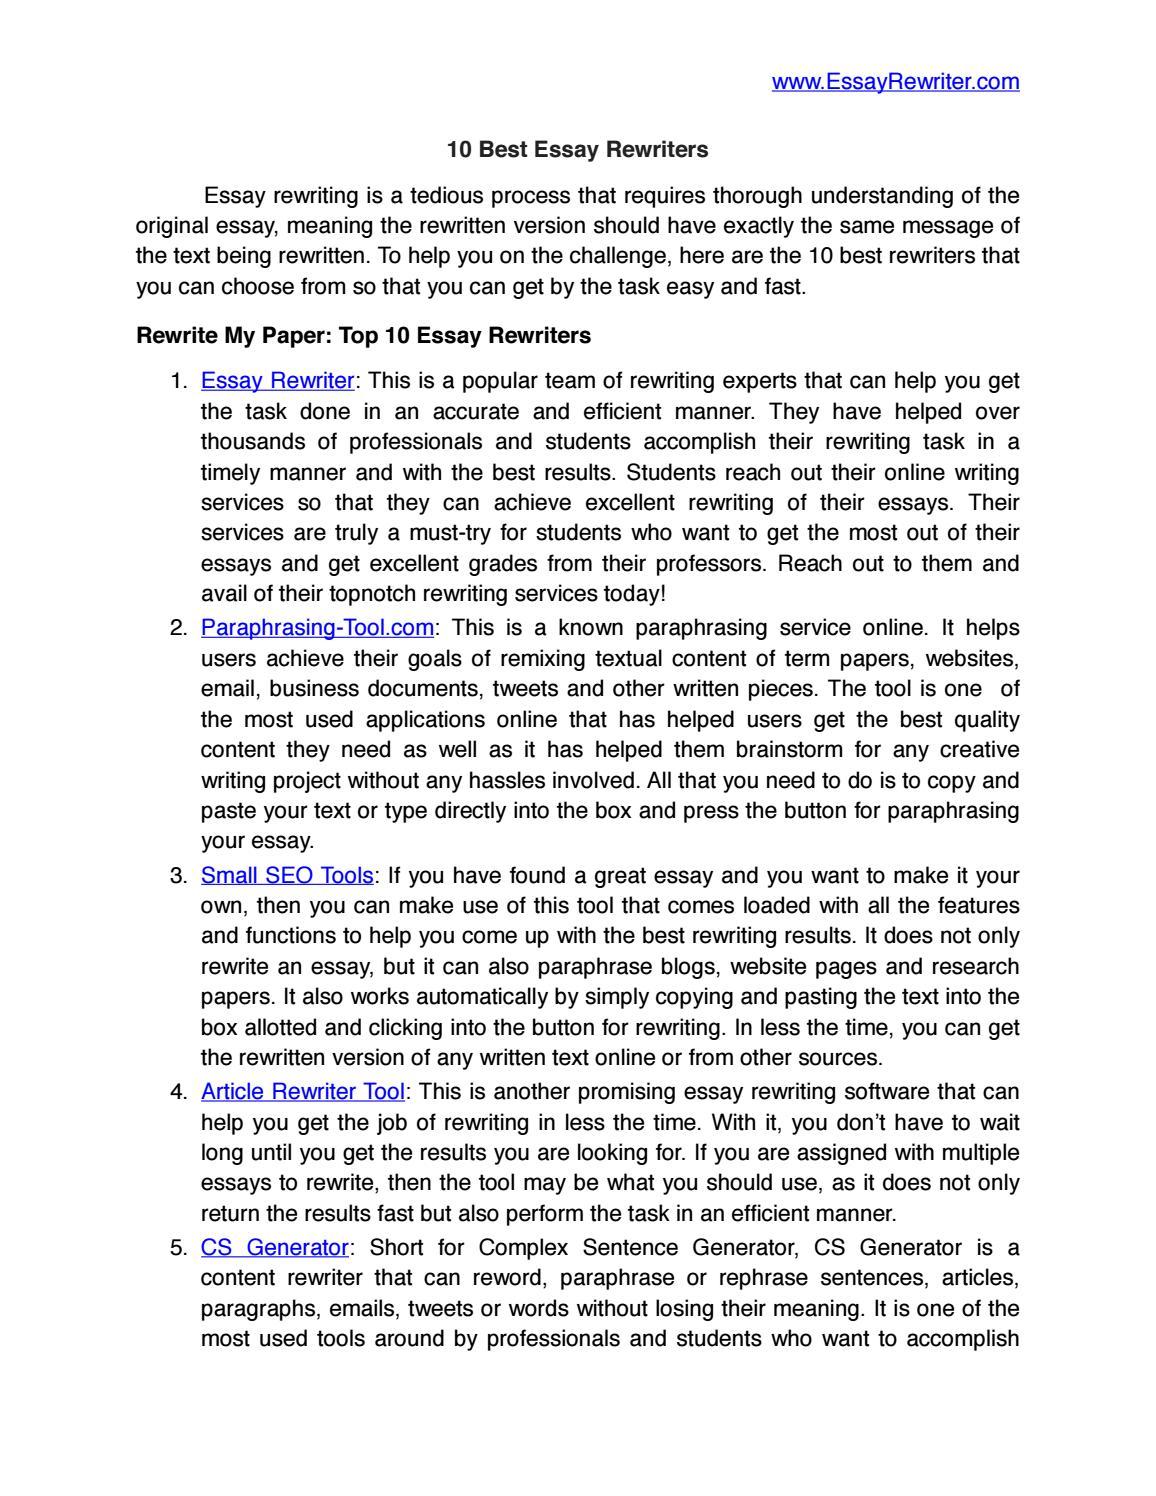 012 Page 1 Essay Example Singular Rewriter Free Software Crack Generator Full